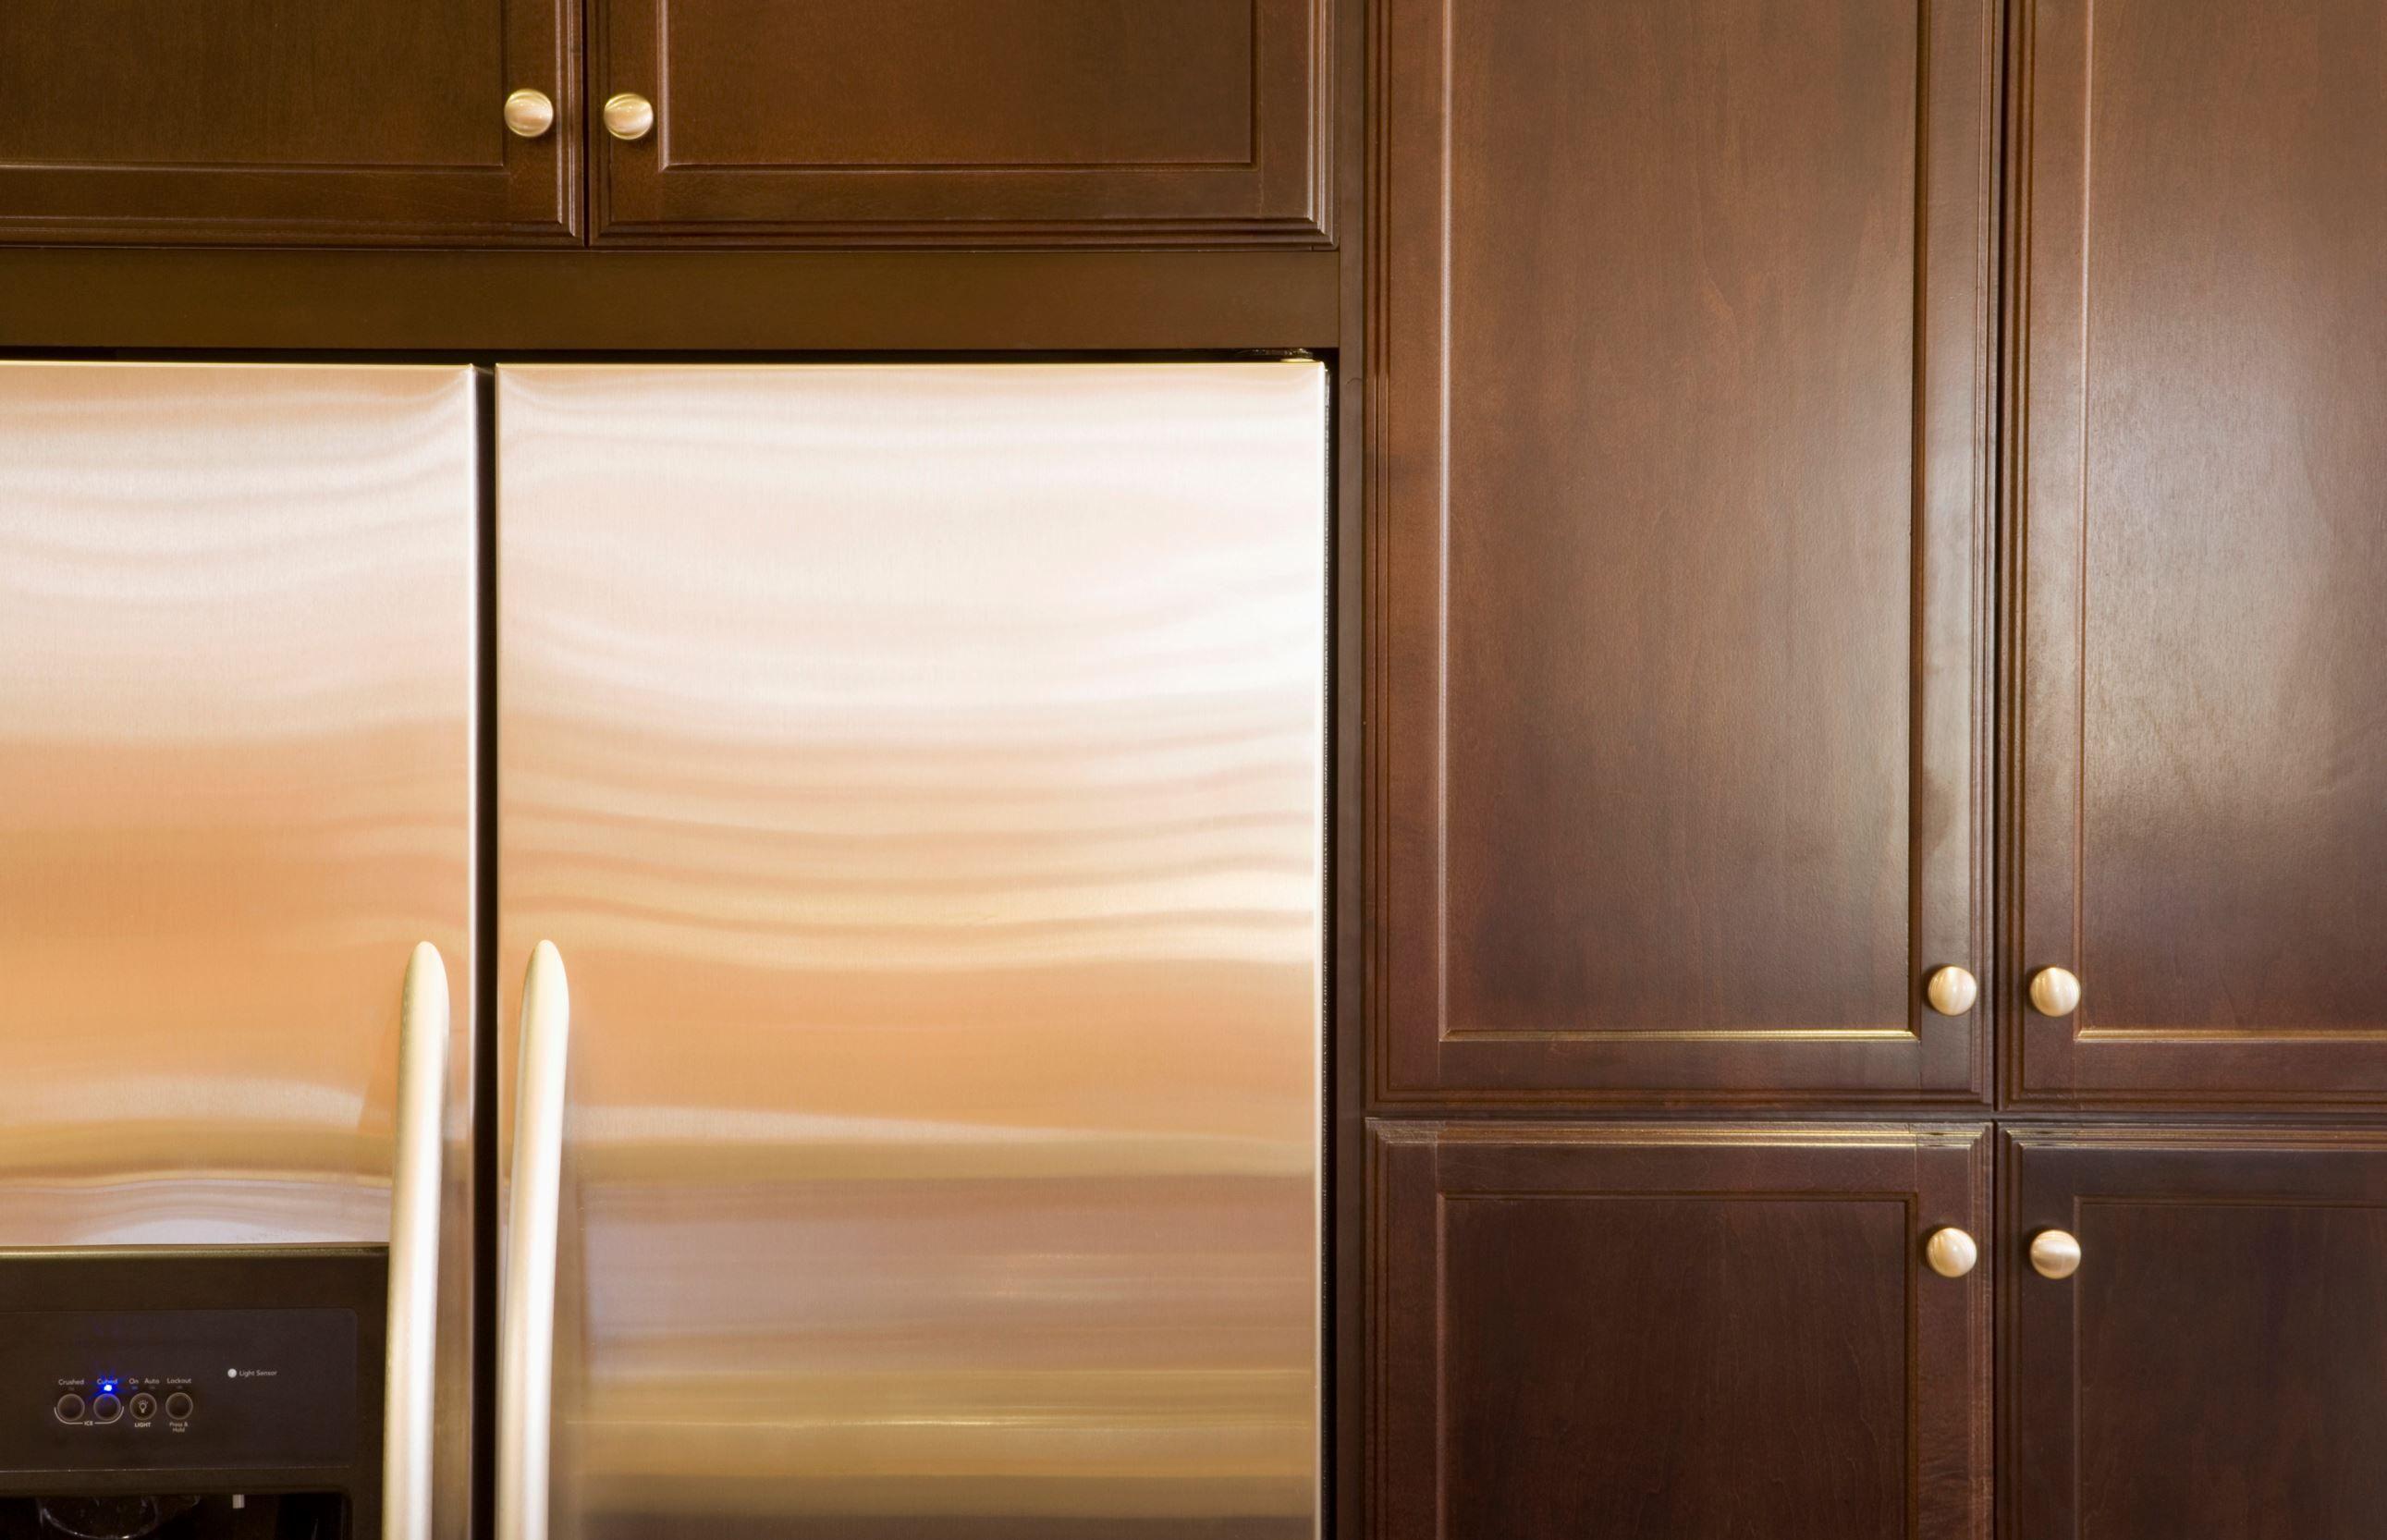 5 Sneaky Ways To Hide Kitchen Clutter Best Kitchen Cabinets Glass Kitchen Cabinet Doors Types Of Kitchen Cabinets